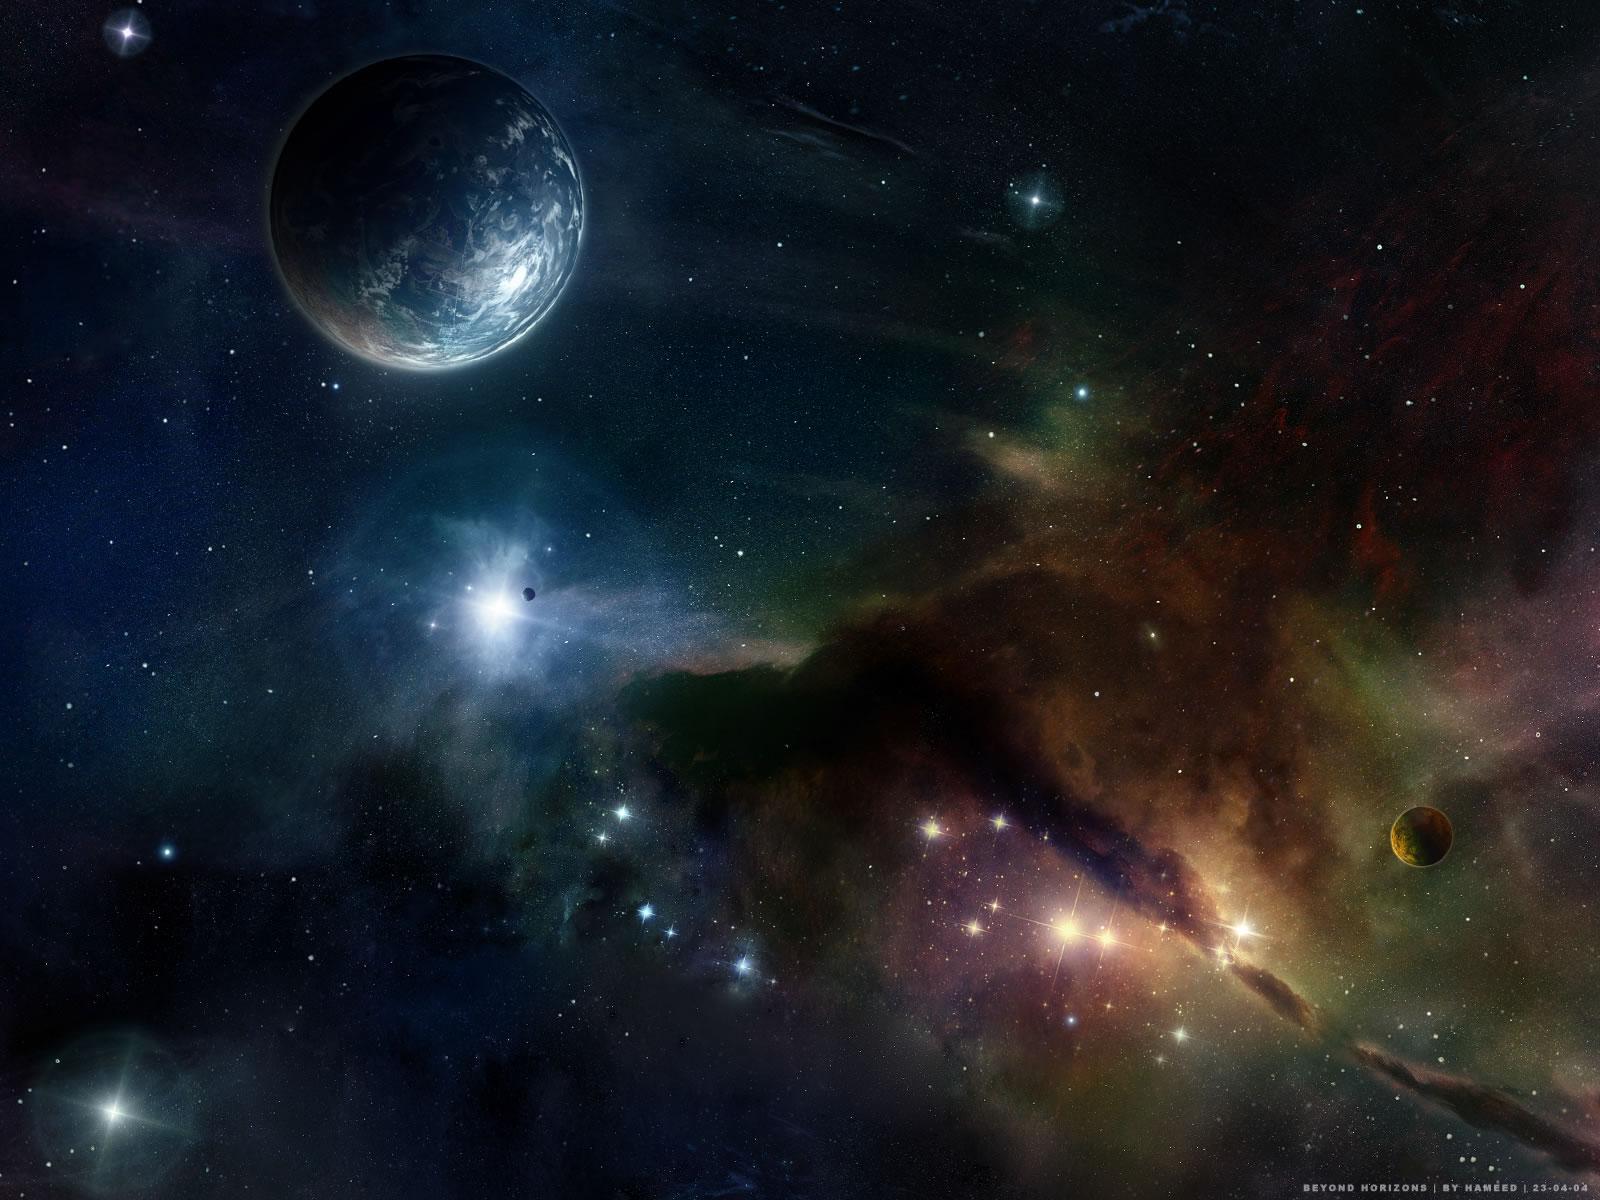 Digital space   Space Wallpaper 24645191 1600x1200